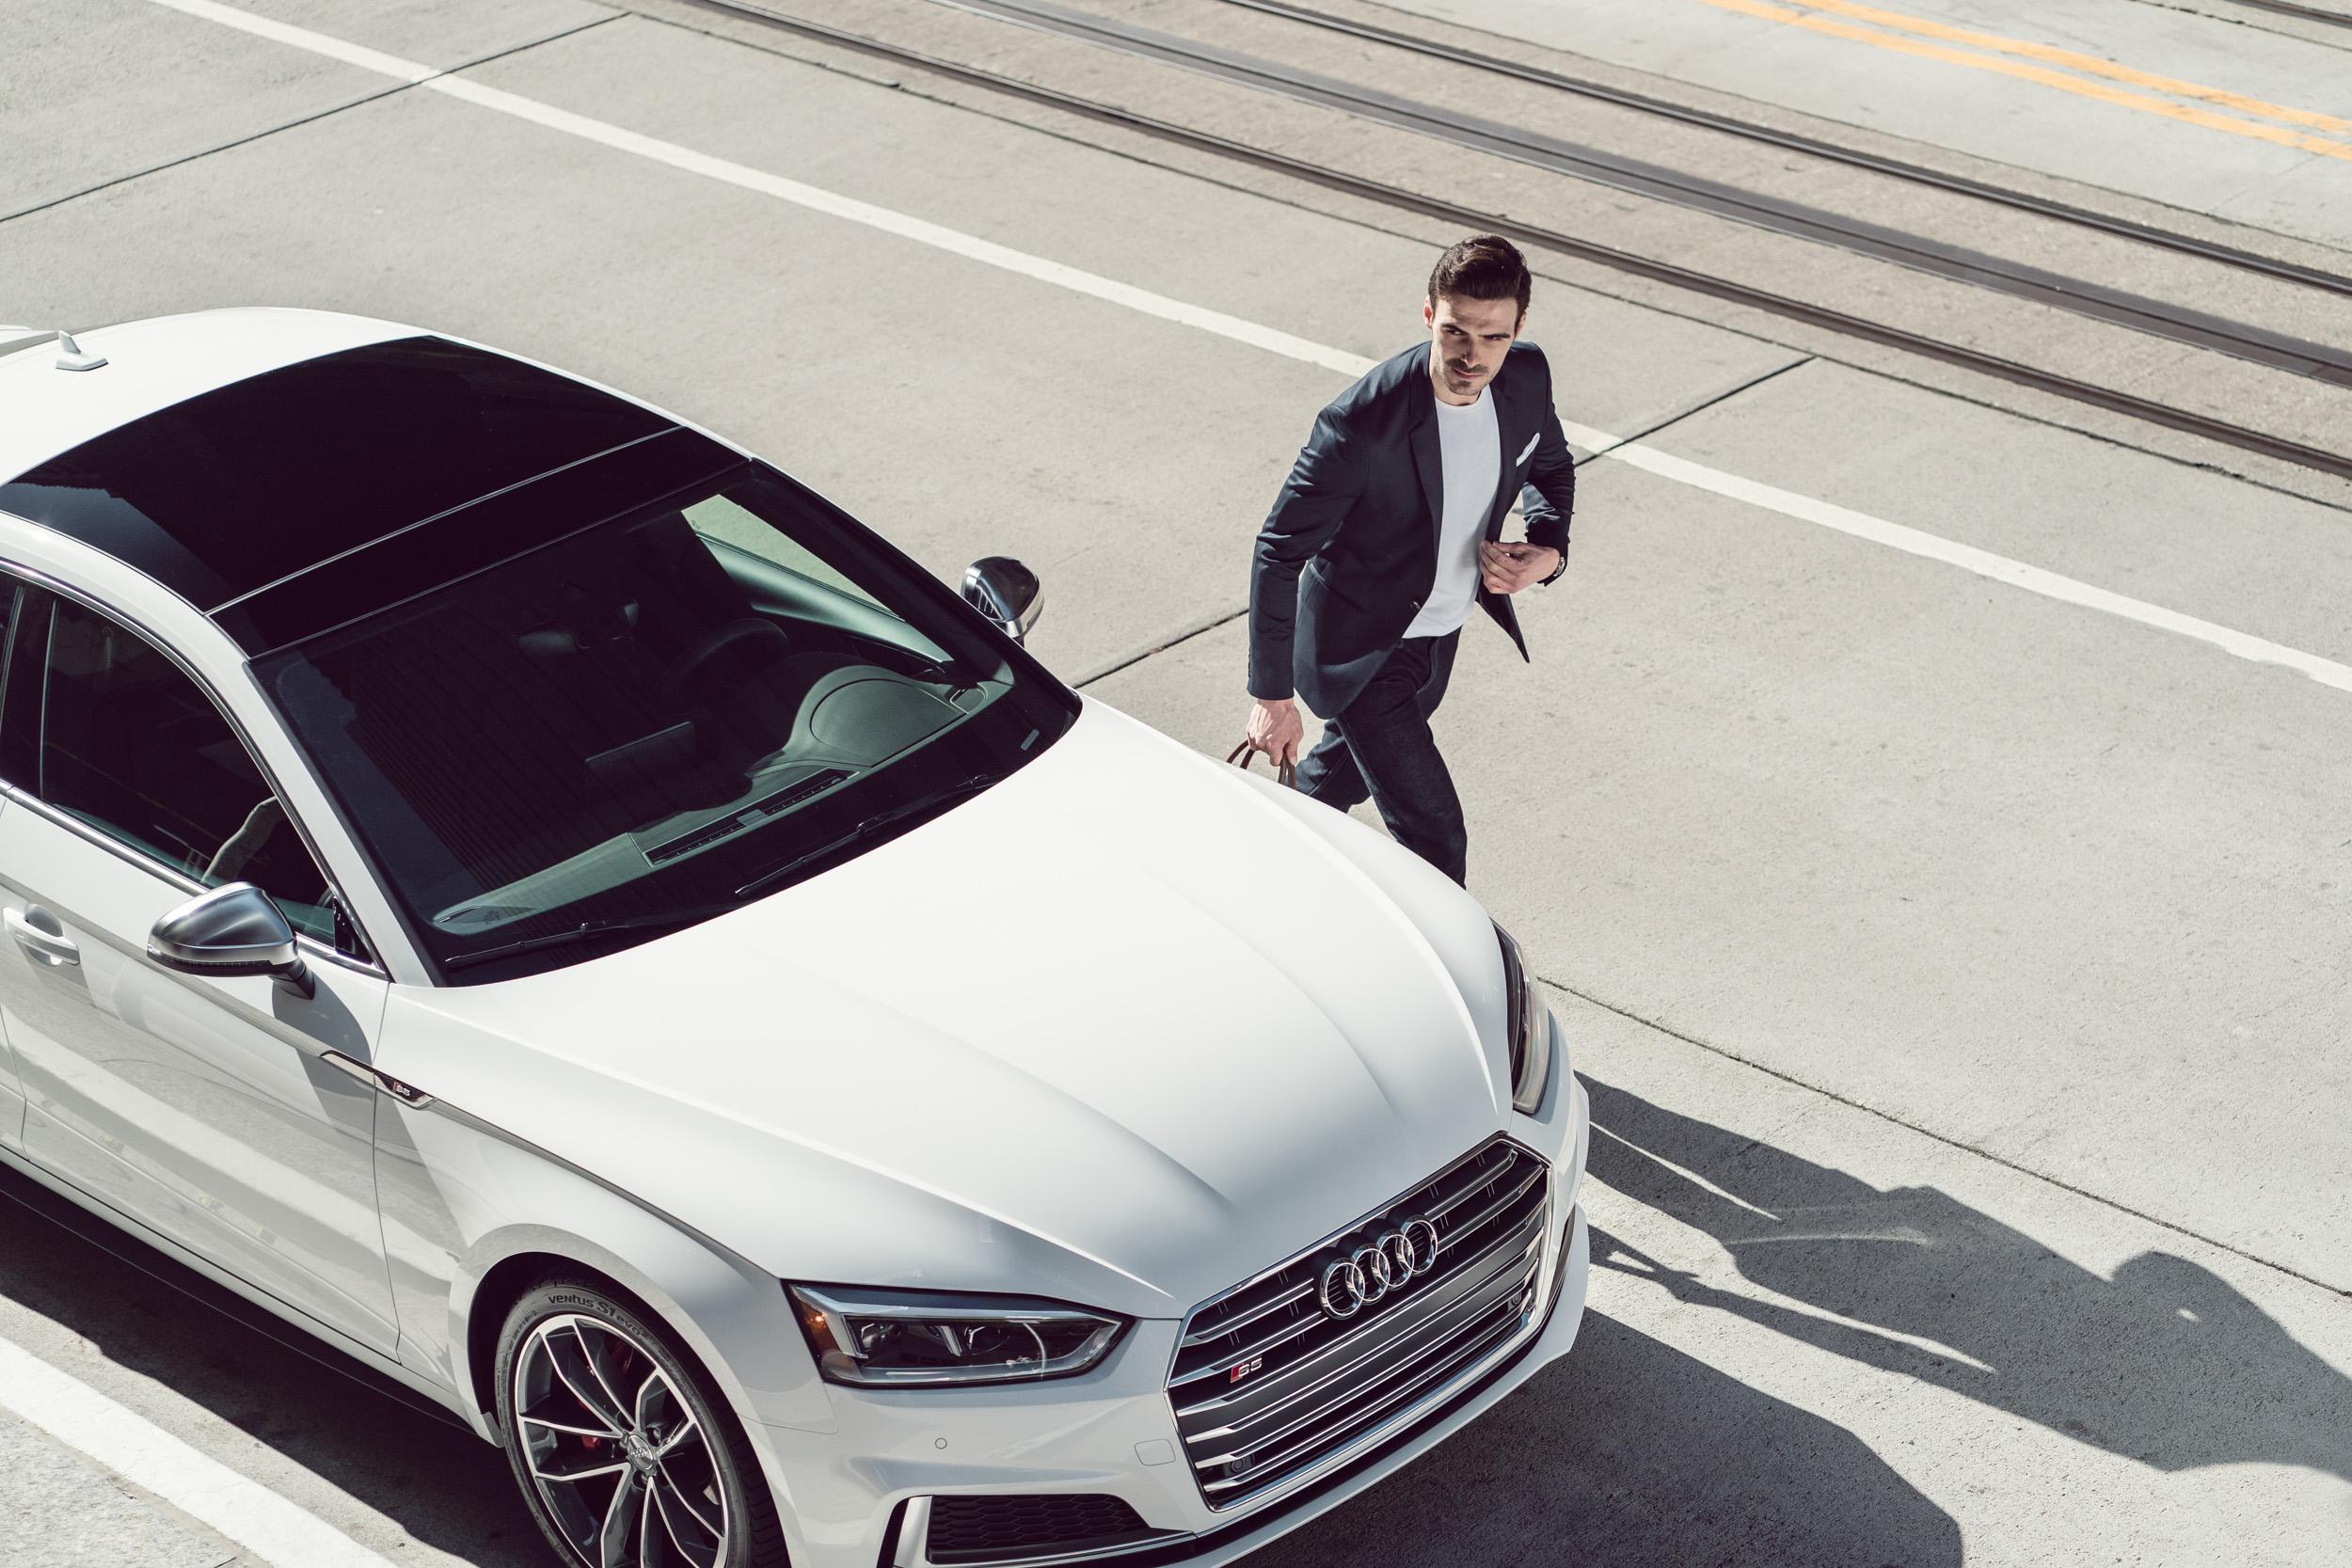 Objktv_SQ_OBJKTV_MaxRes_Automotive_Audi_BAX9048 (1).jpg